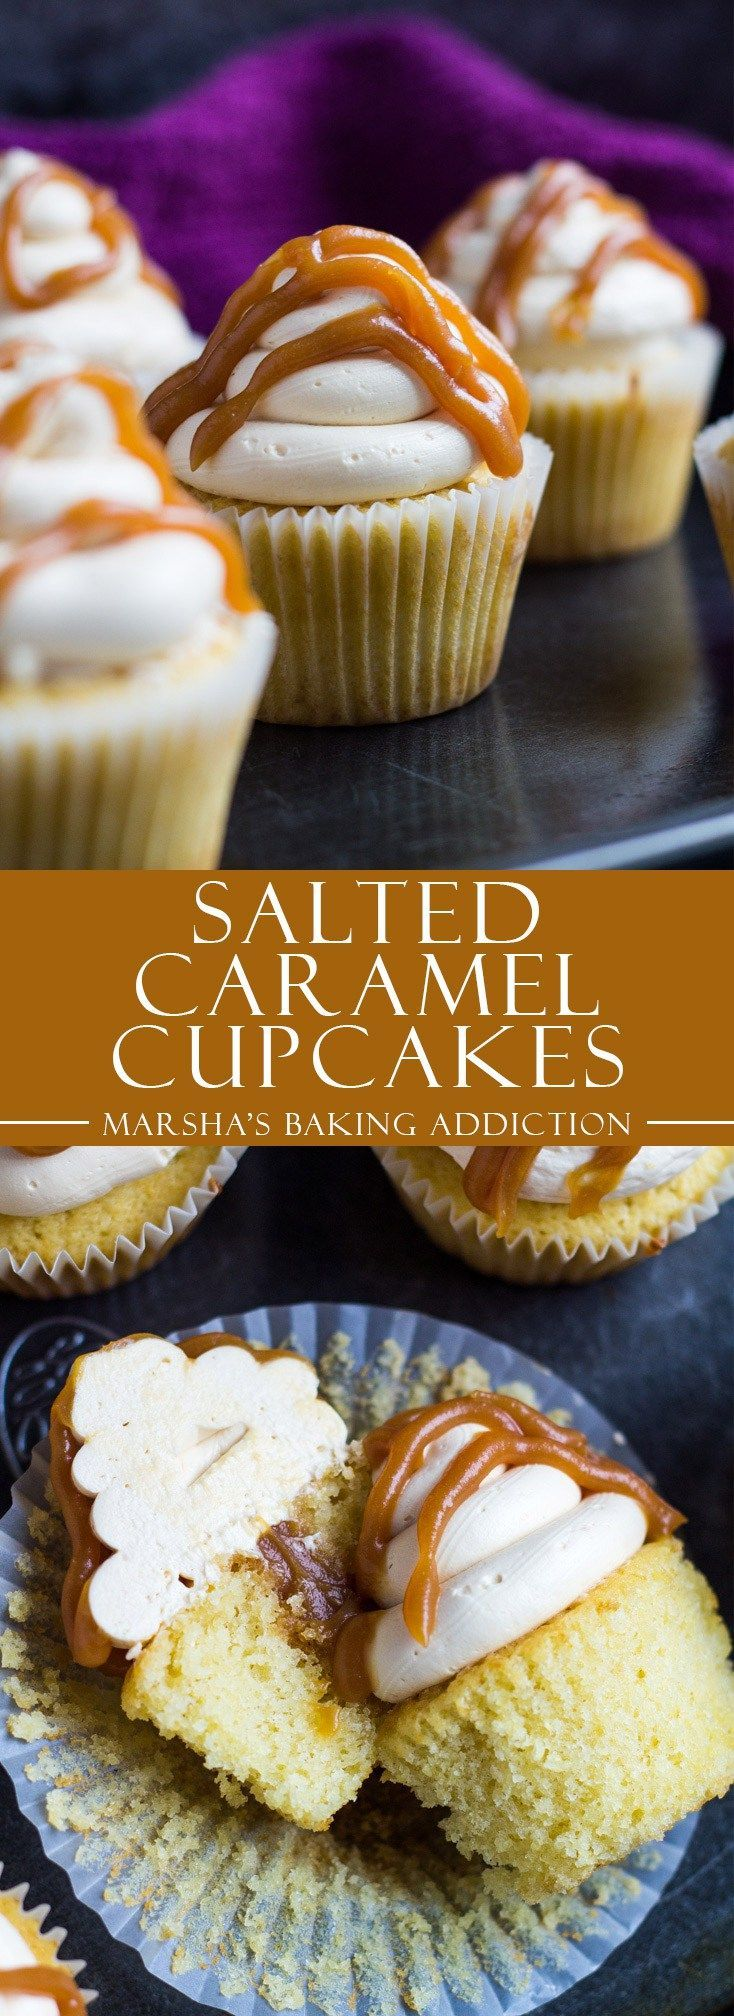 Salted Caramel Cupcakes | http://marshasbakingaddiction.com /marshasbakeblog/